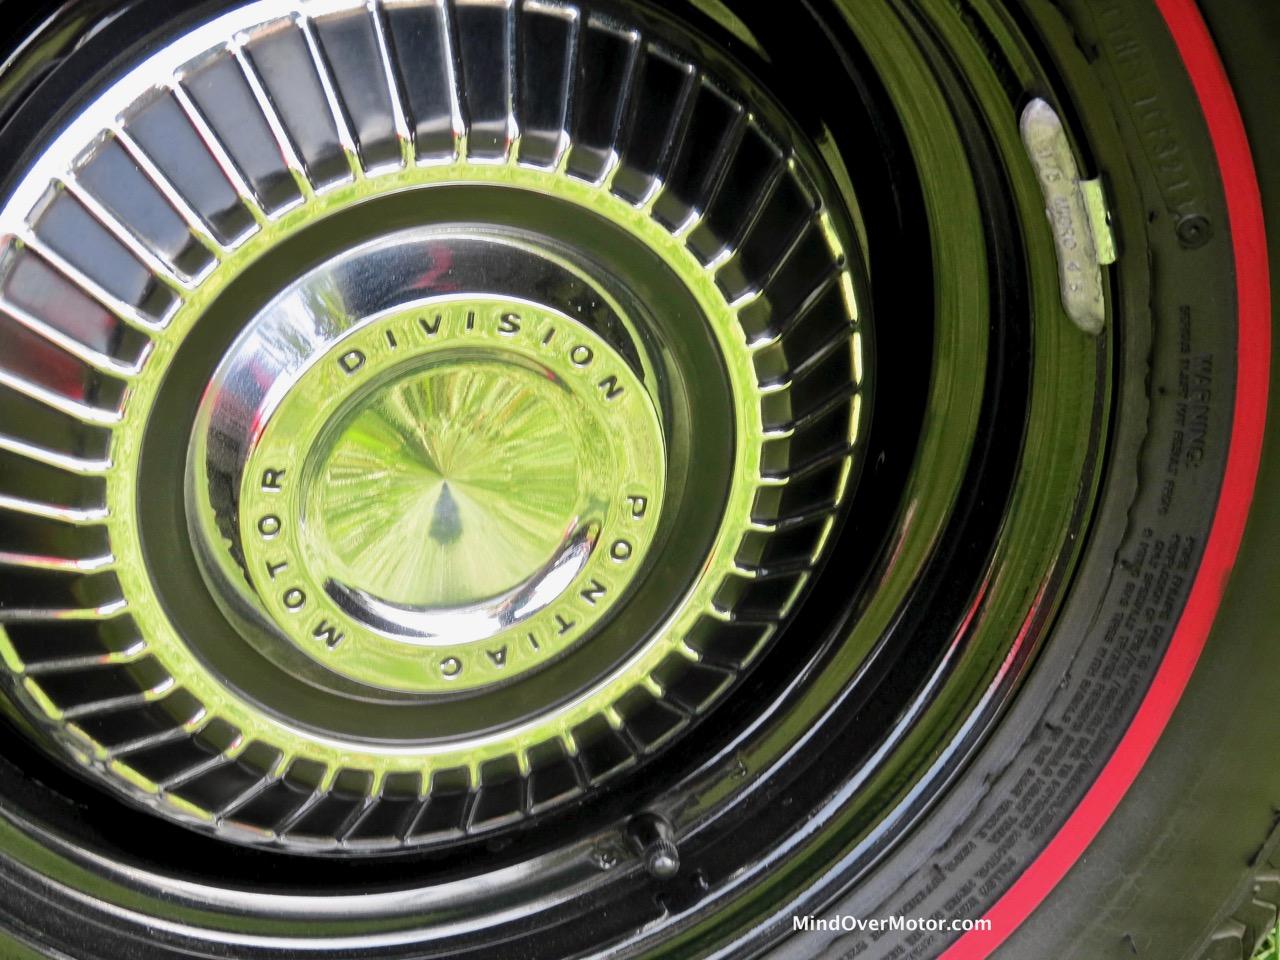 1967 Pontiac GTO Hubcap